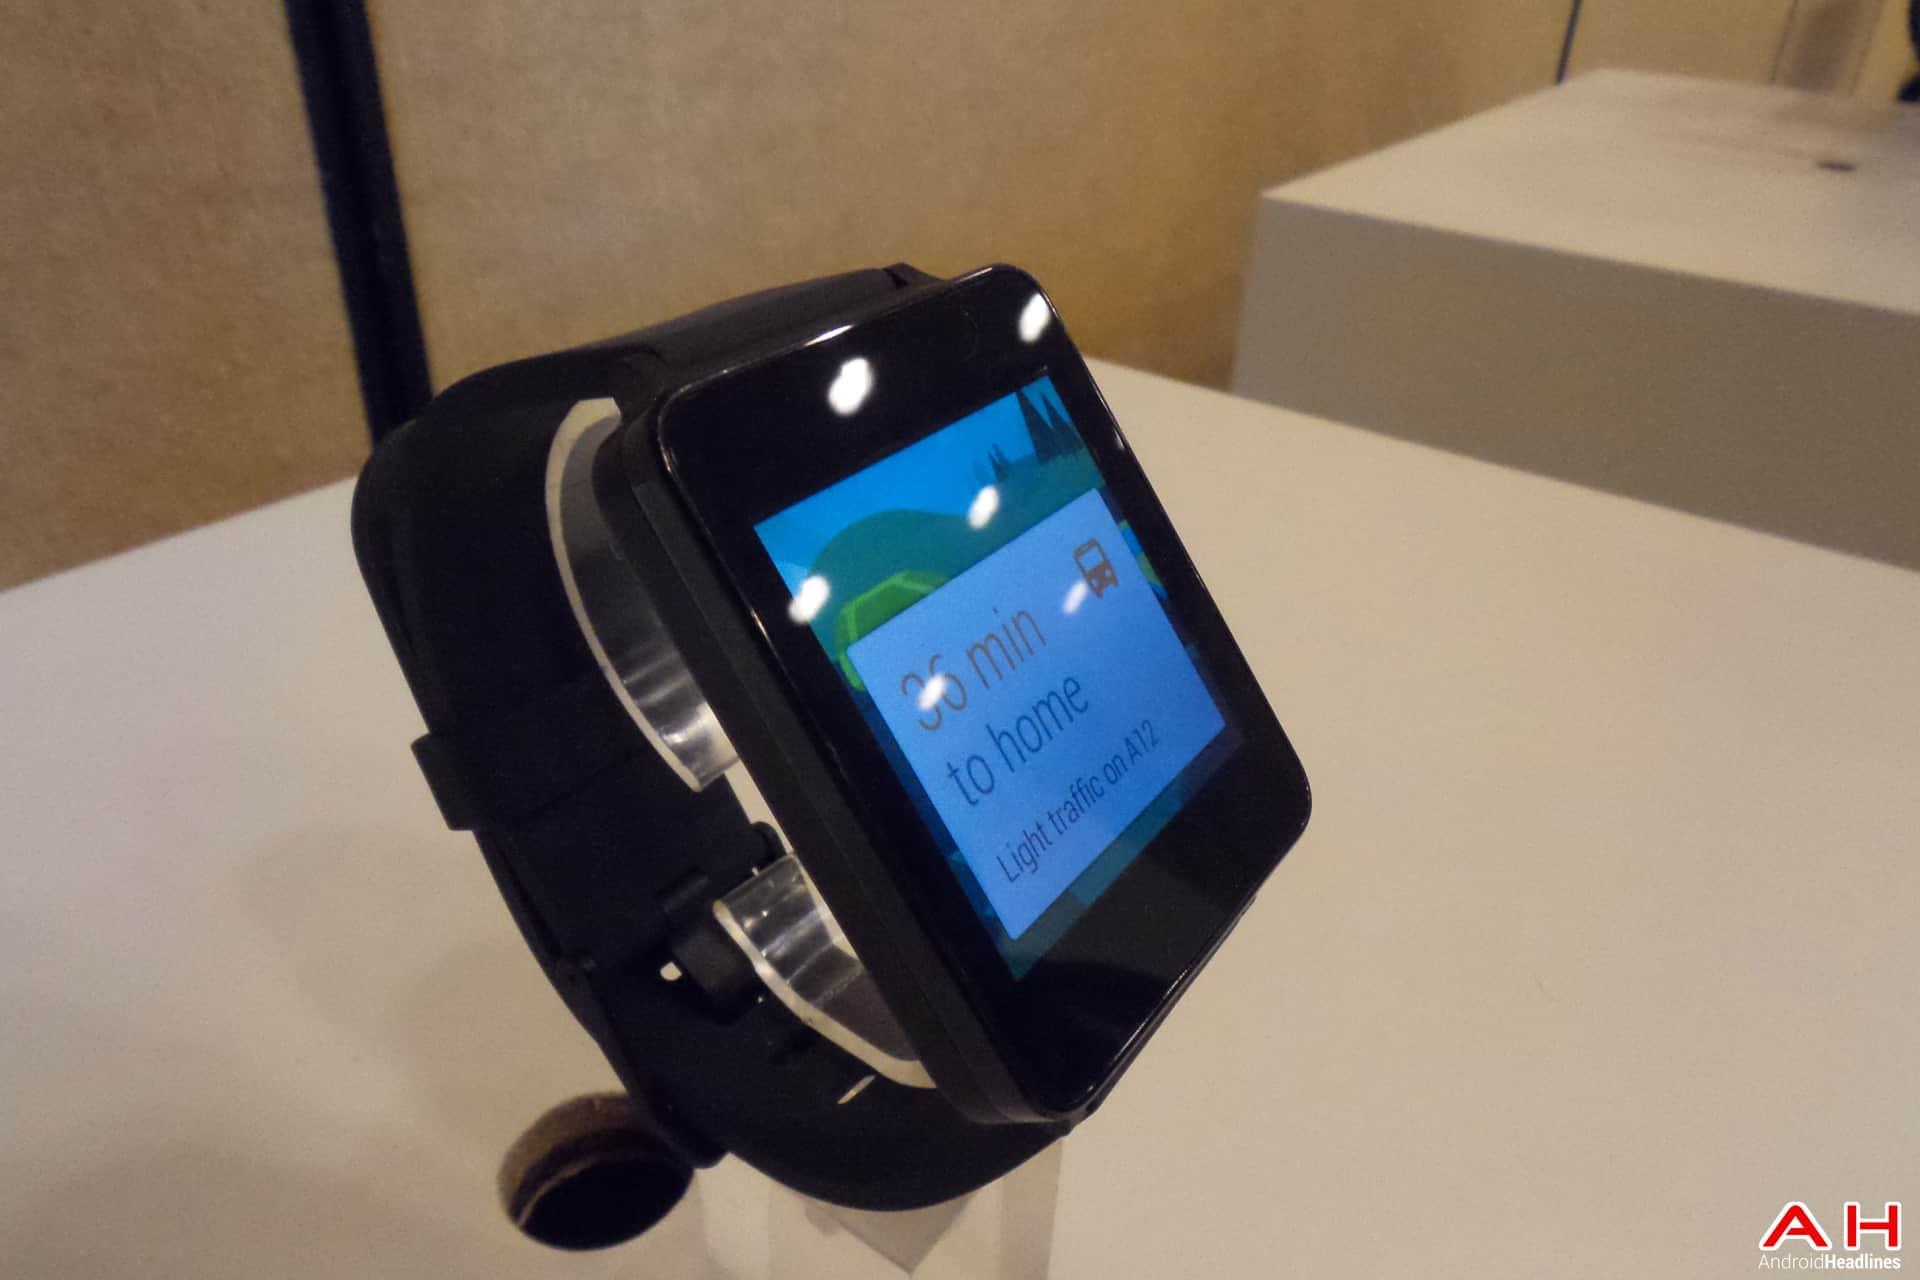 AH Google IO 2014 LG G Watch 1 of 10